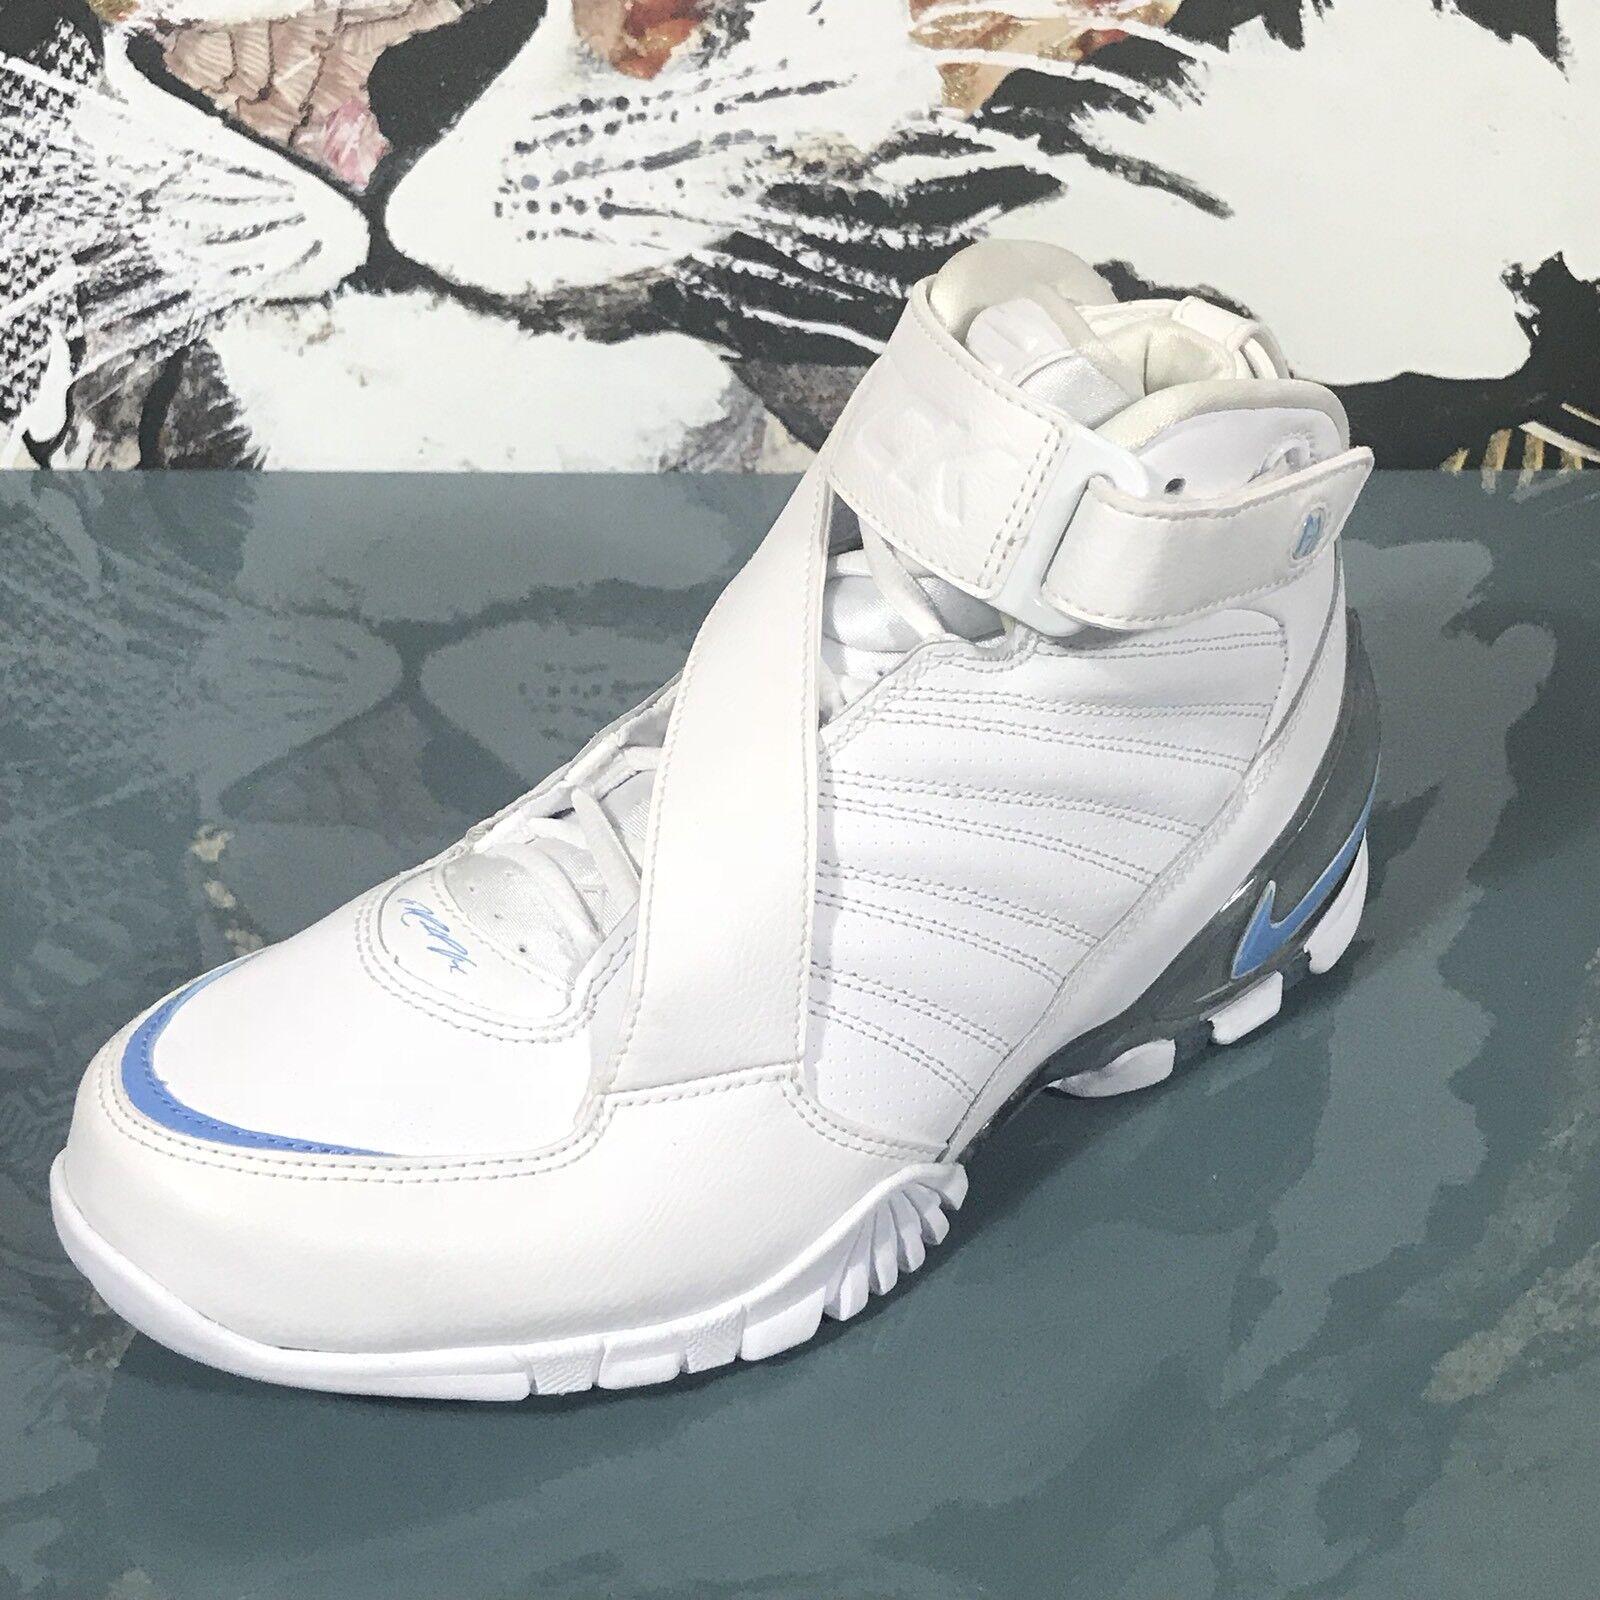 Cheap women's shoes women's shoes NEW NIKE Men's Zoom Vick III White University Blue Sneakers 832698 100 Comfortable